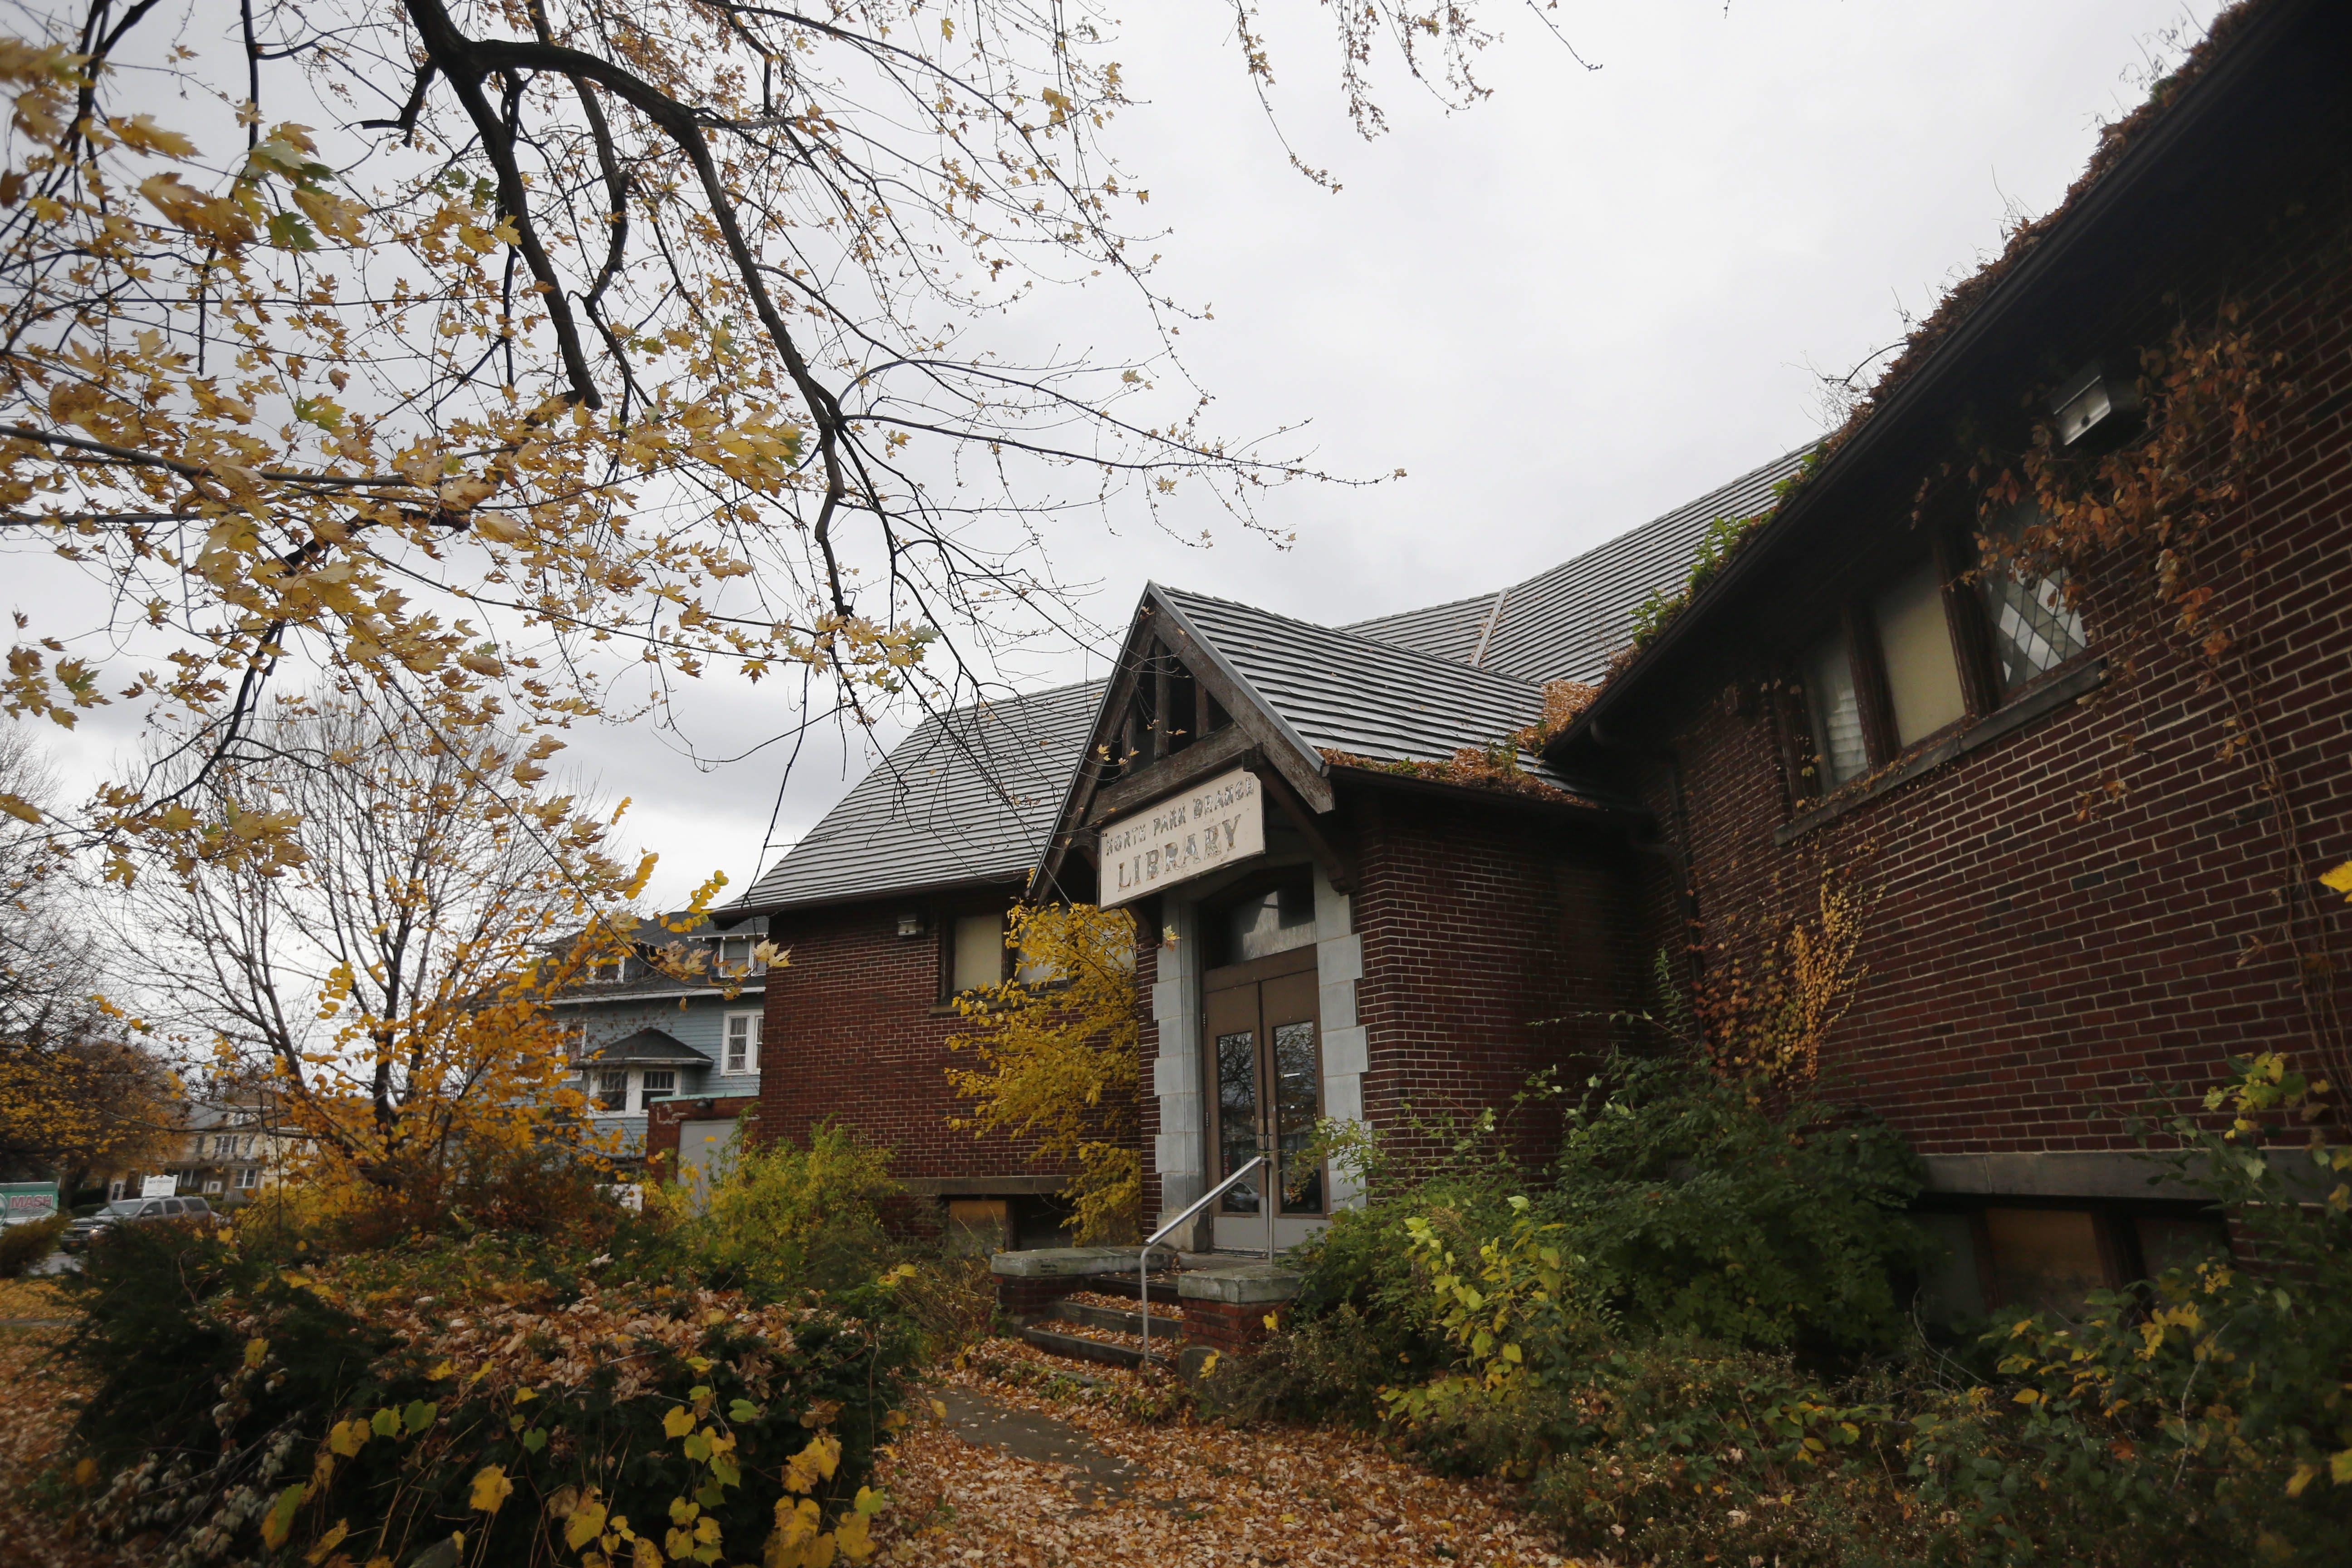 The North Park Library building on Hertel Avenue. (Derek Gee/News file photo)